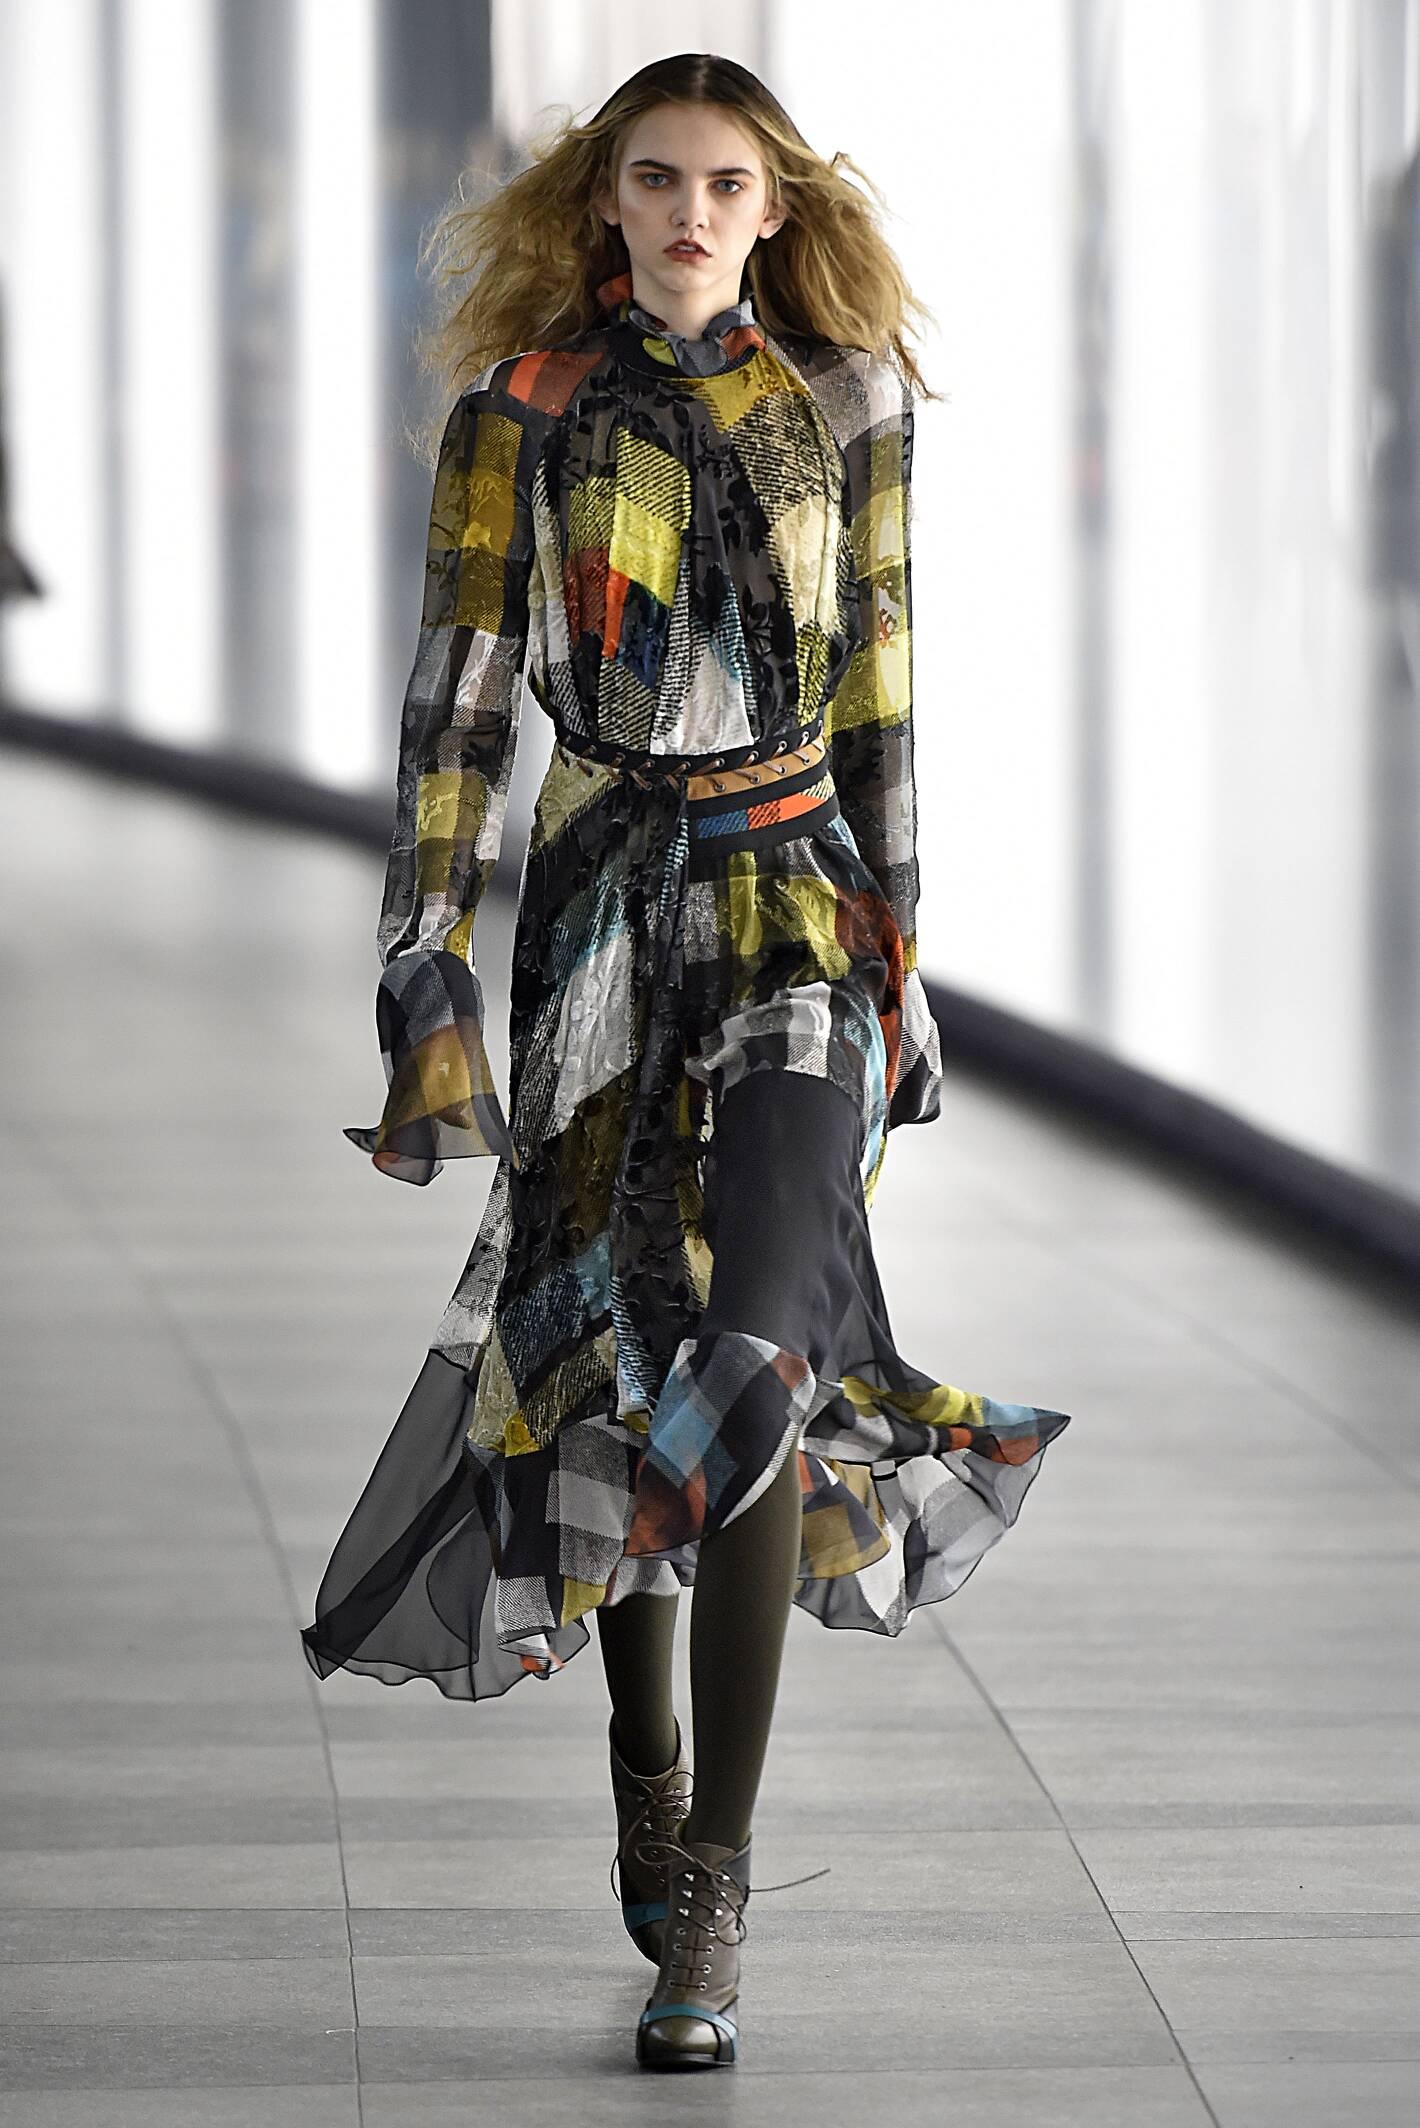 Fall Fashion Woman Preen by Thornton Bregazzi Collection